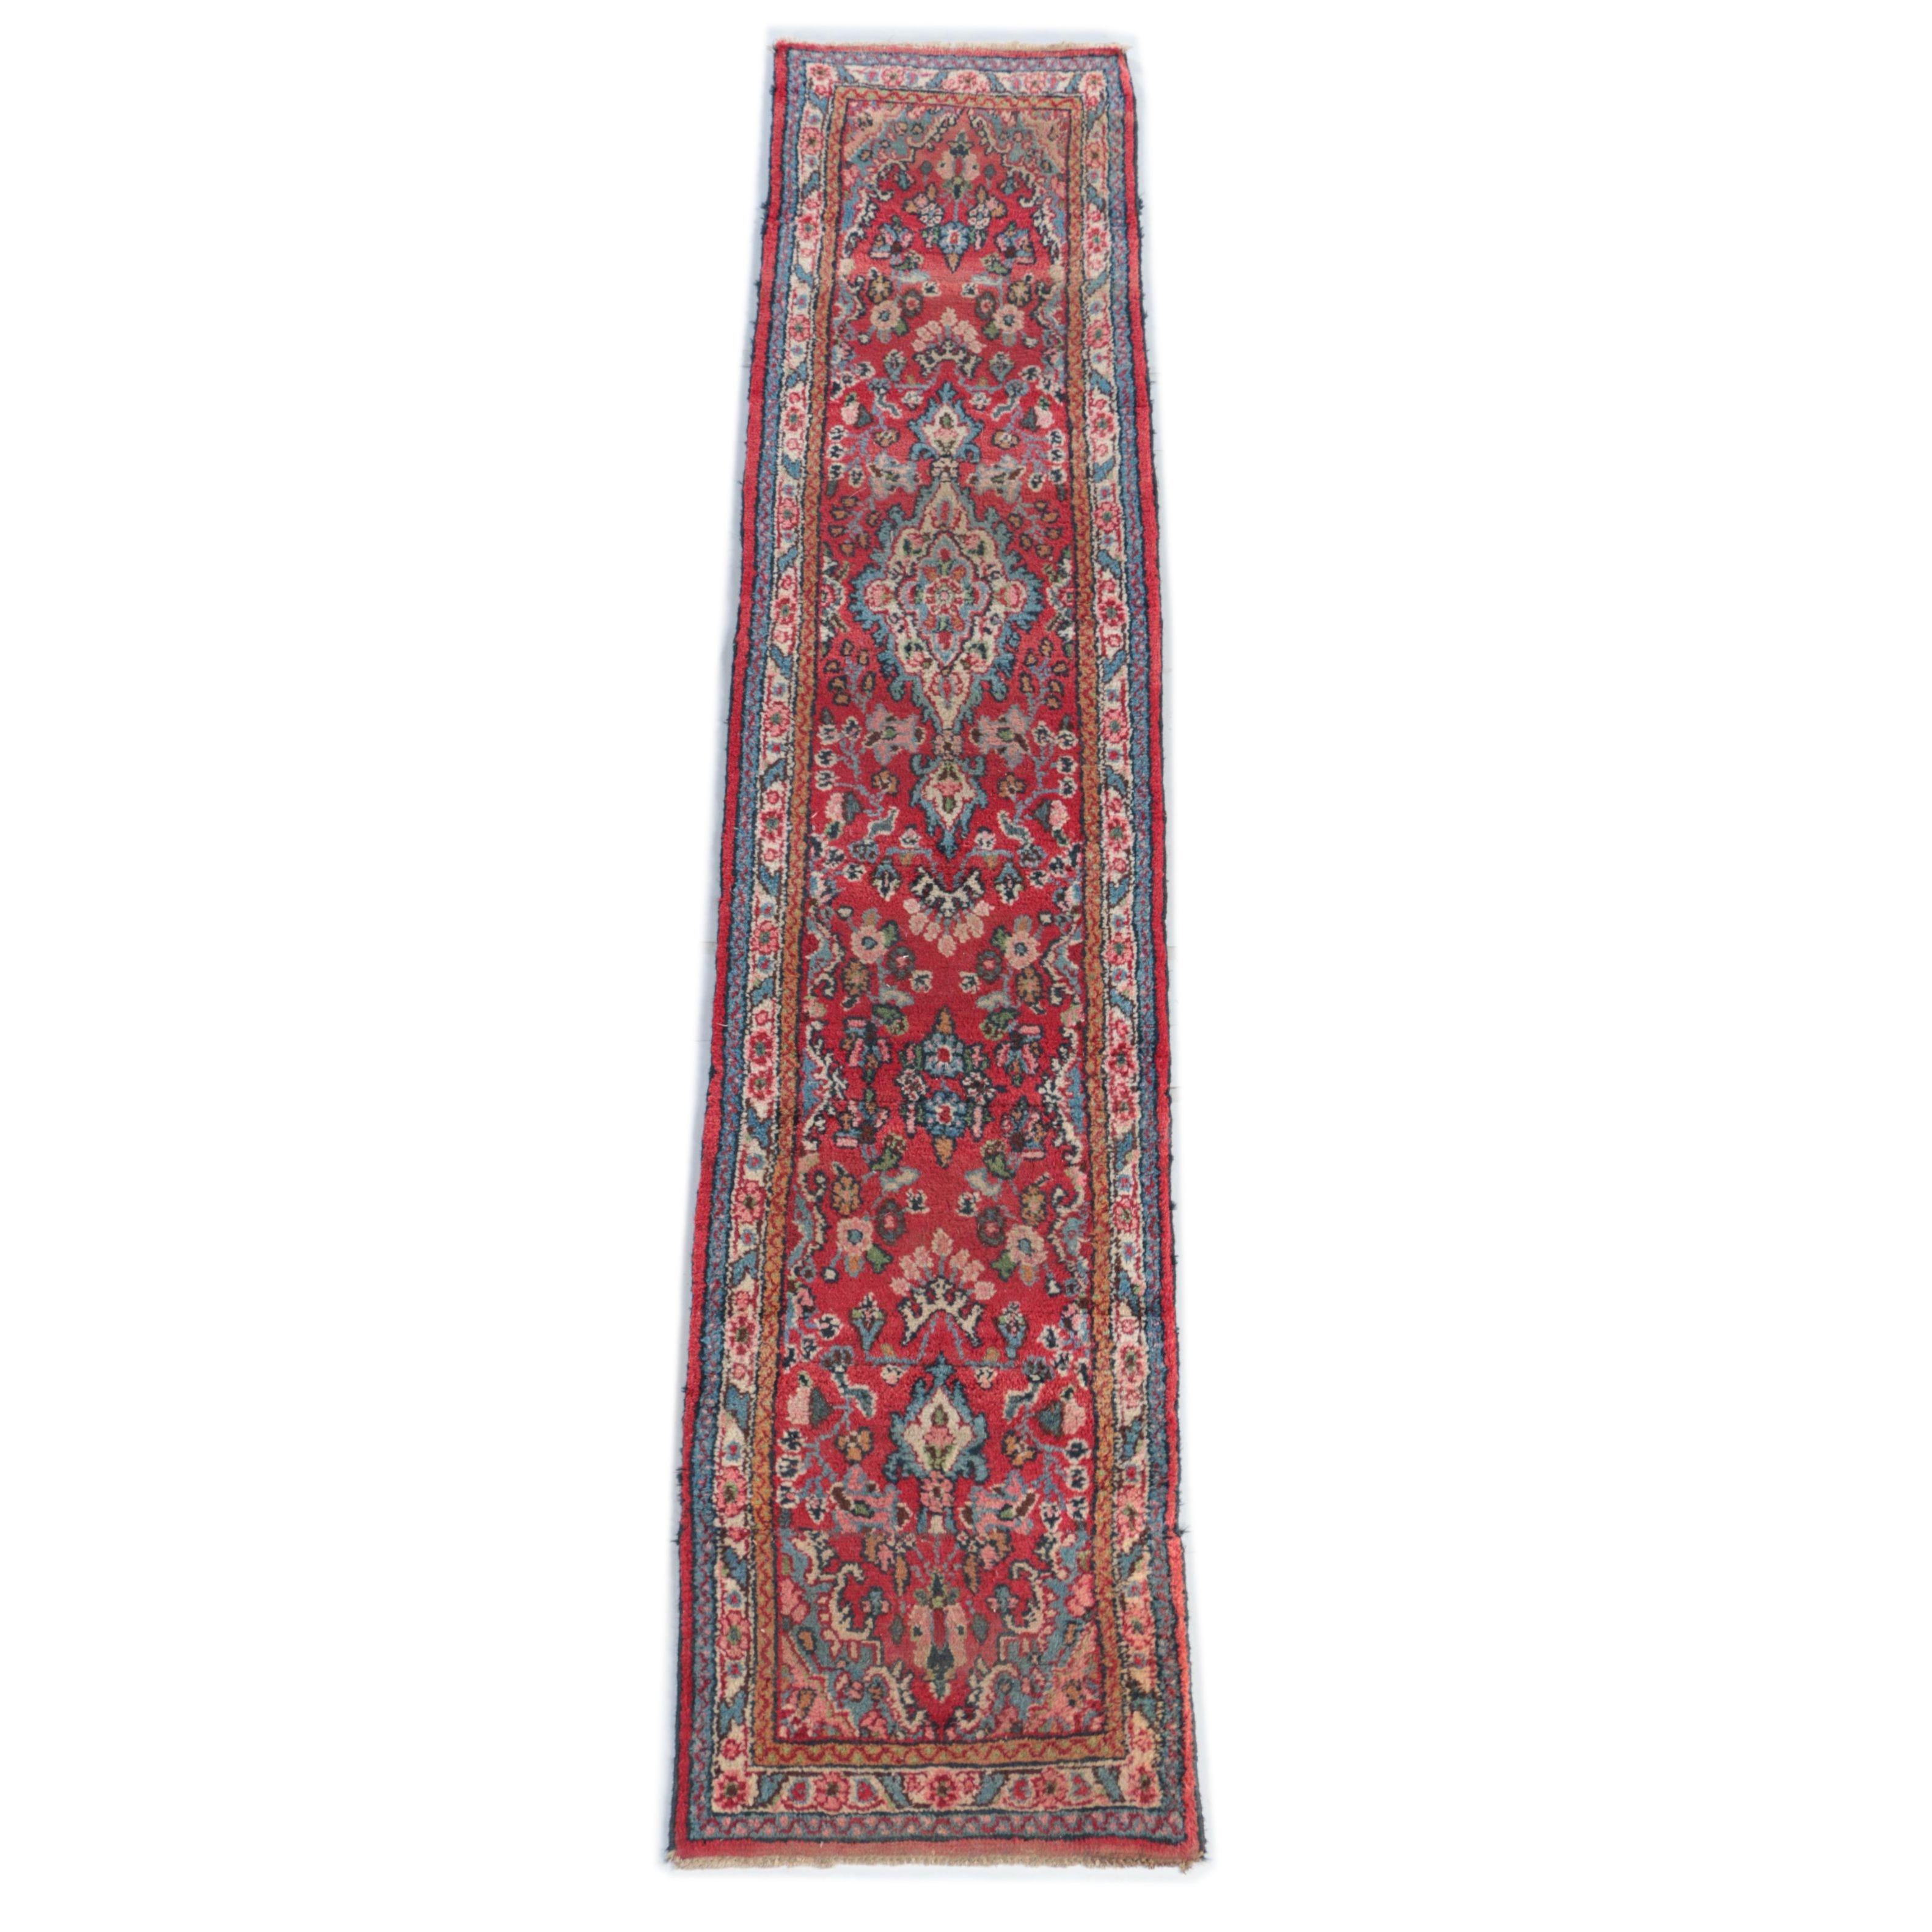 Hand-Knotted Persian Arak Wool Carpet Runner